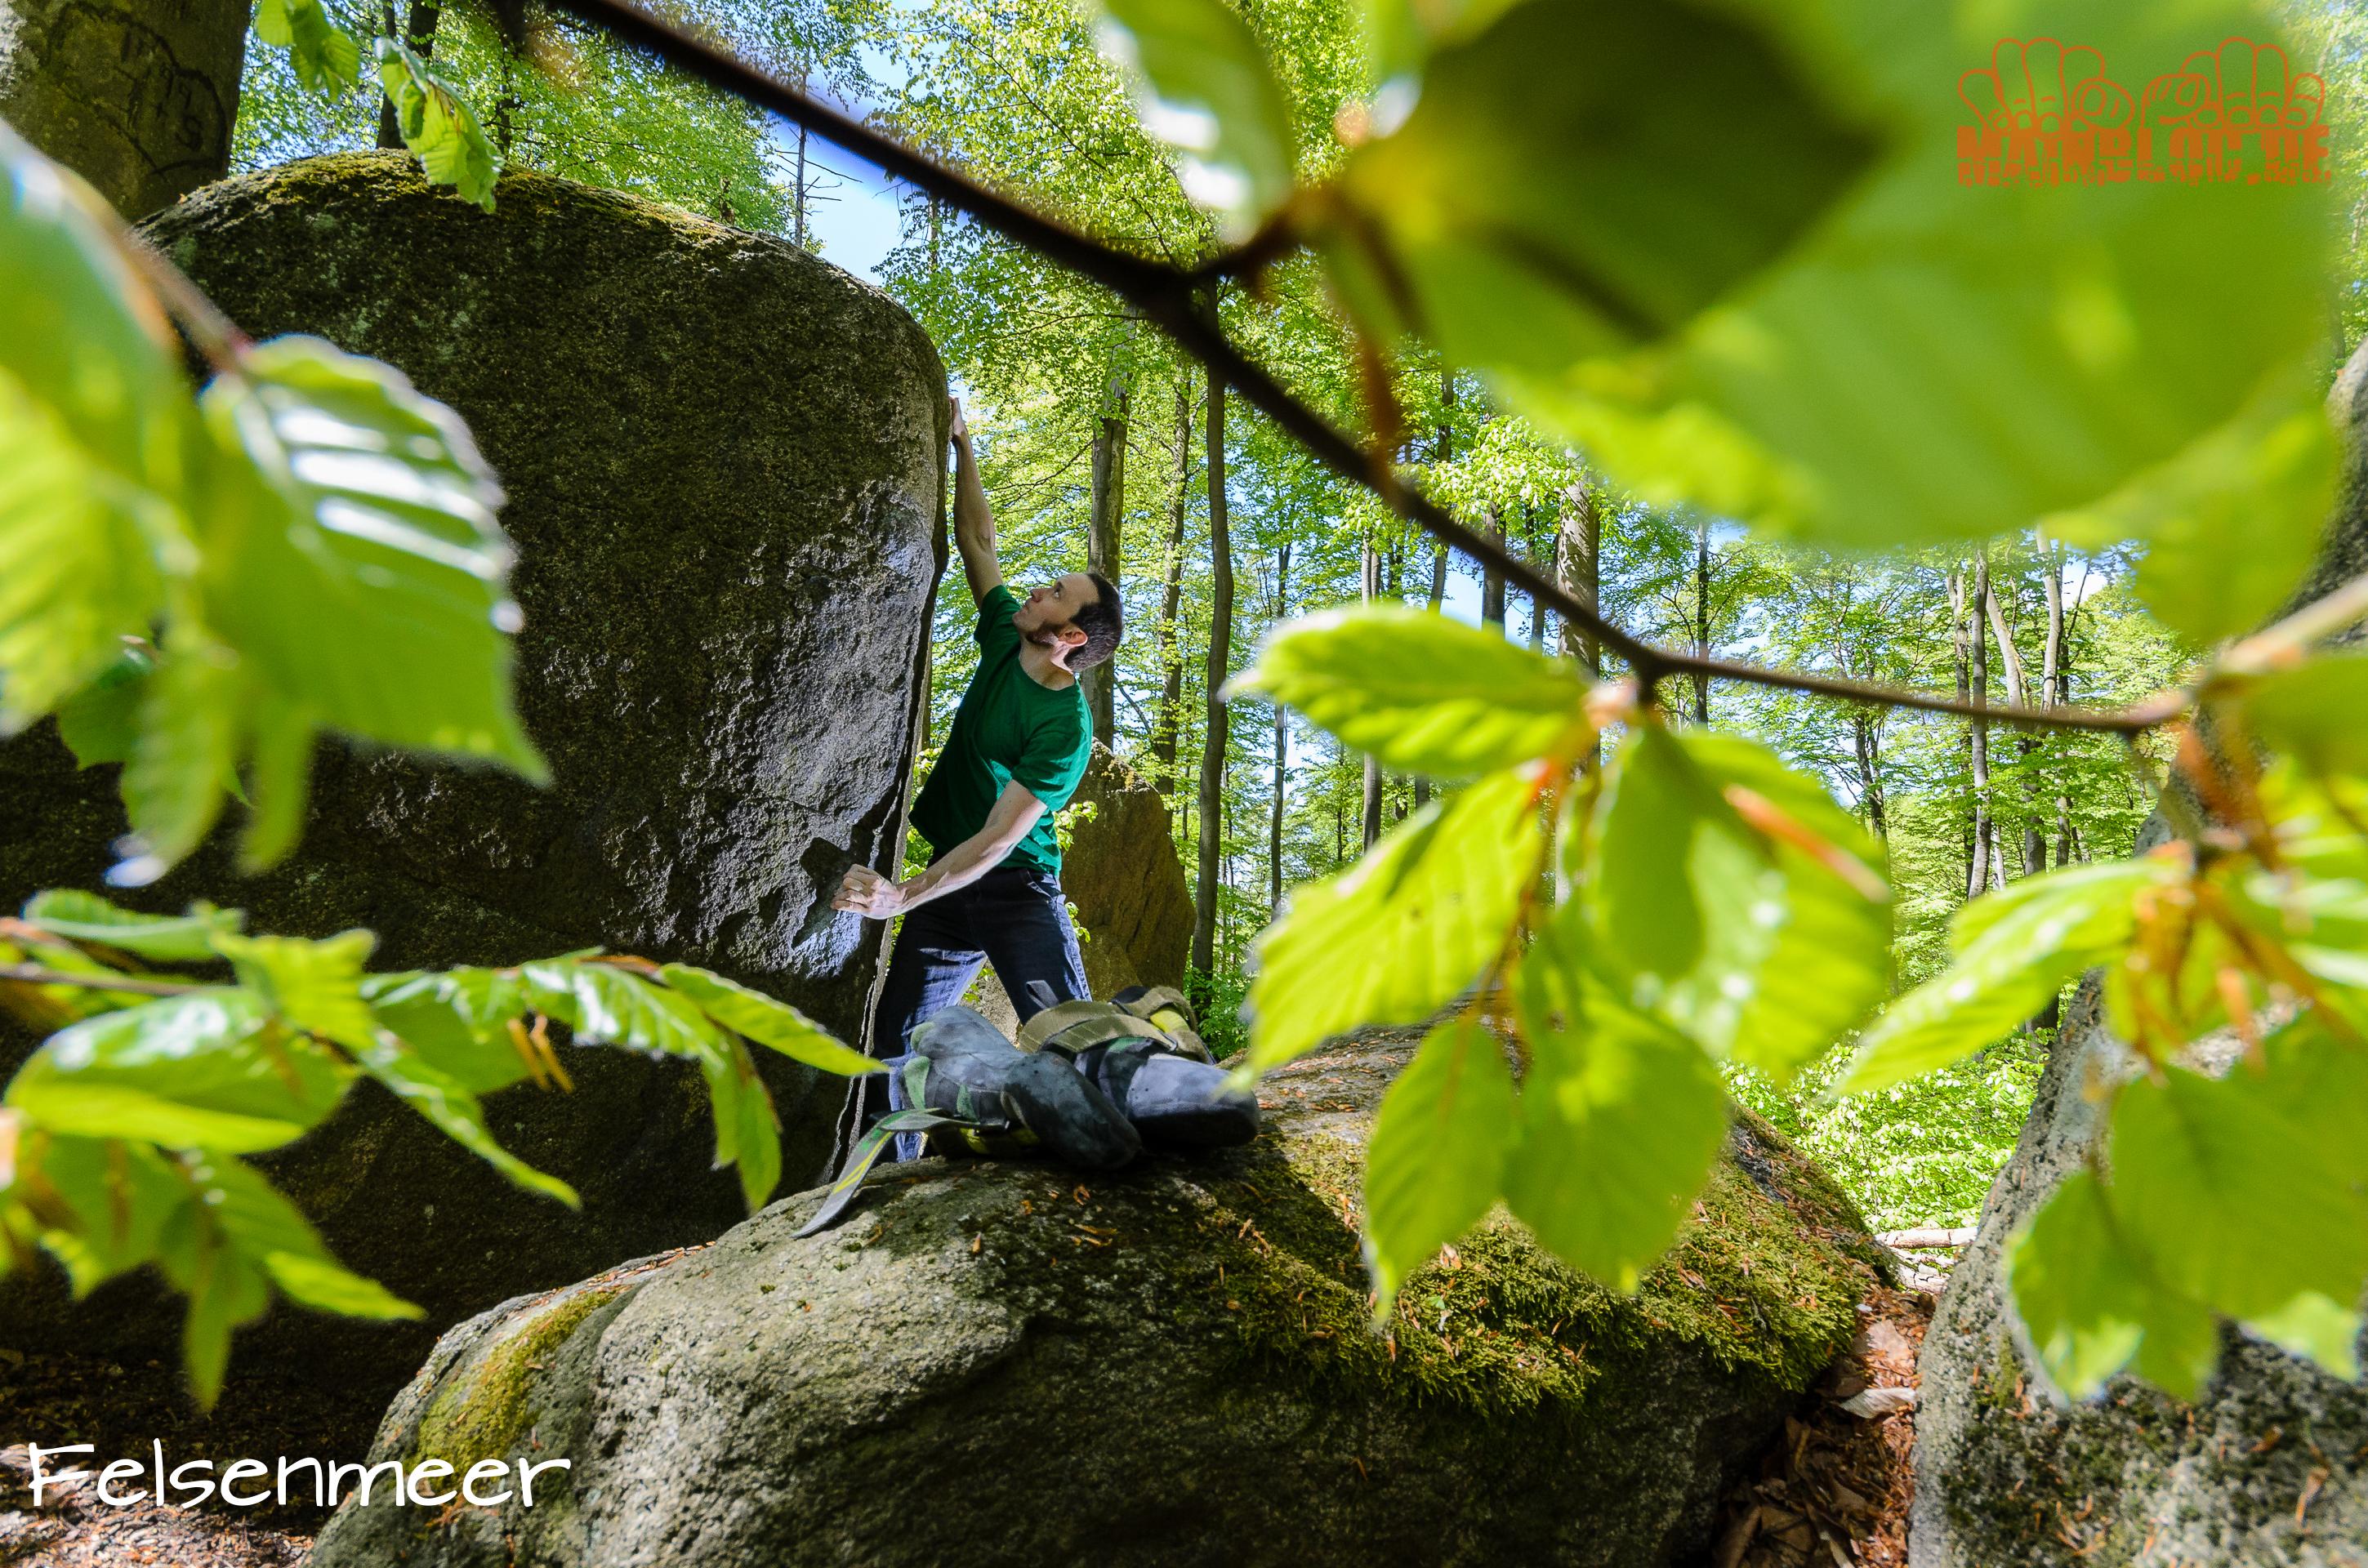 Odenwald, Bouldern, Felsenmeer, Rhein-Main